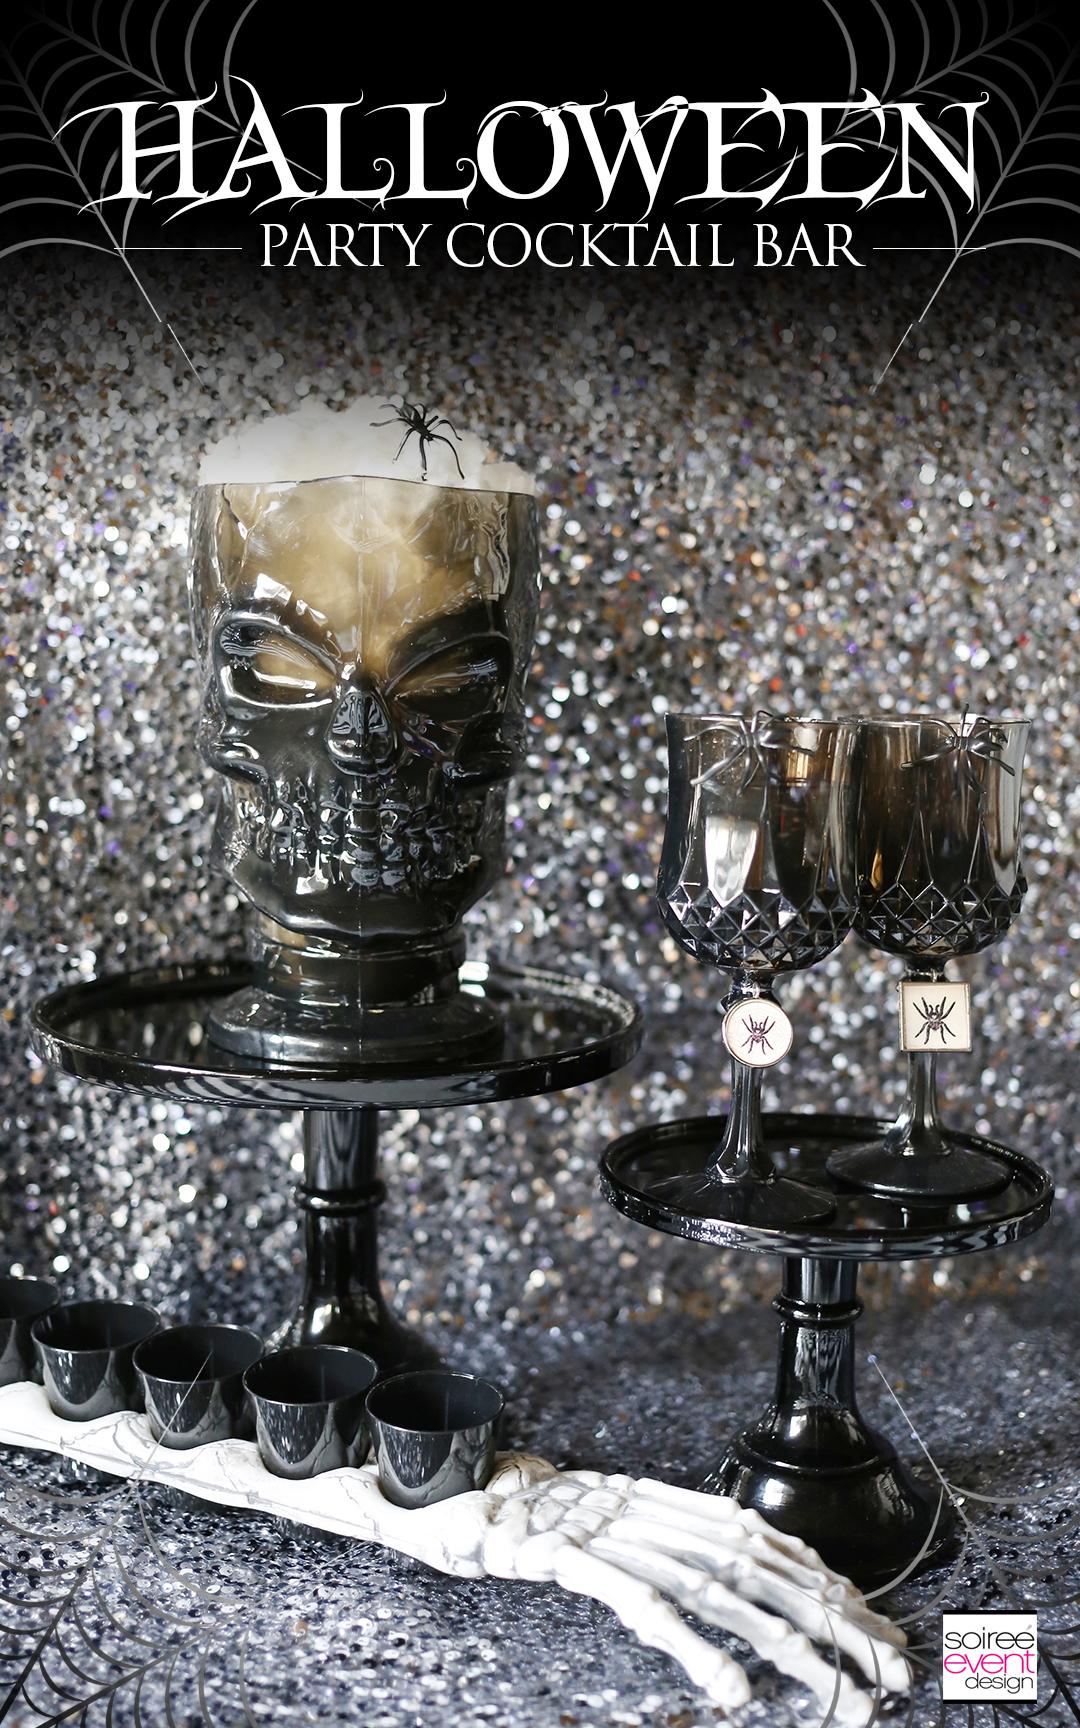 Halloween party cocktail bar, Halloween cocktails, halloween wine glasses